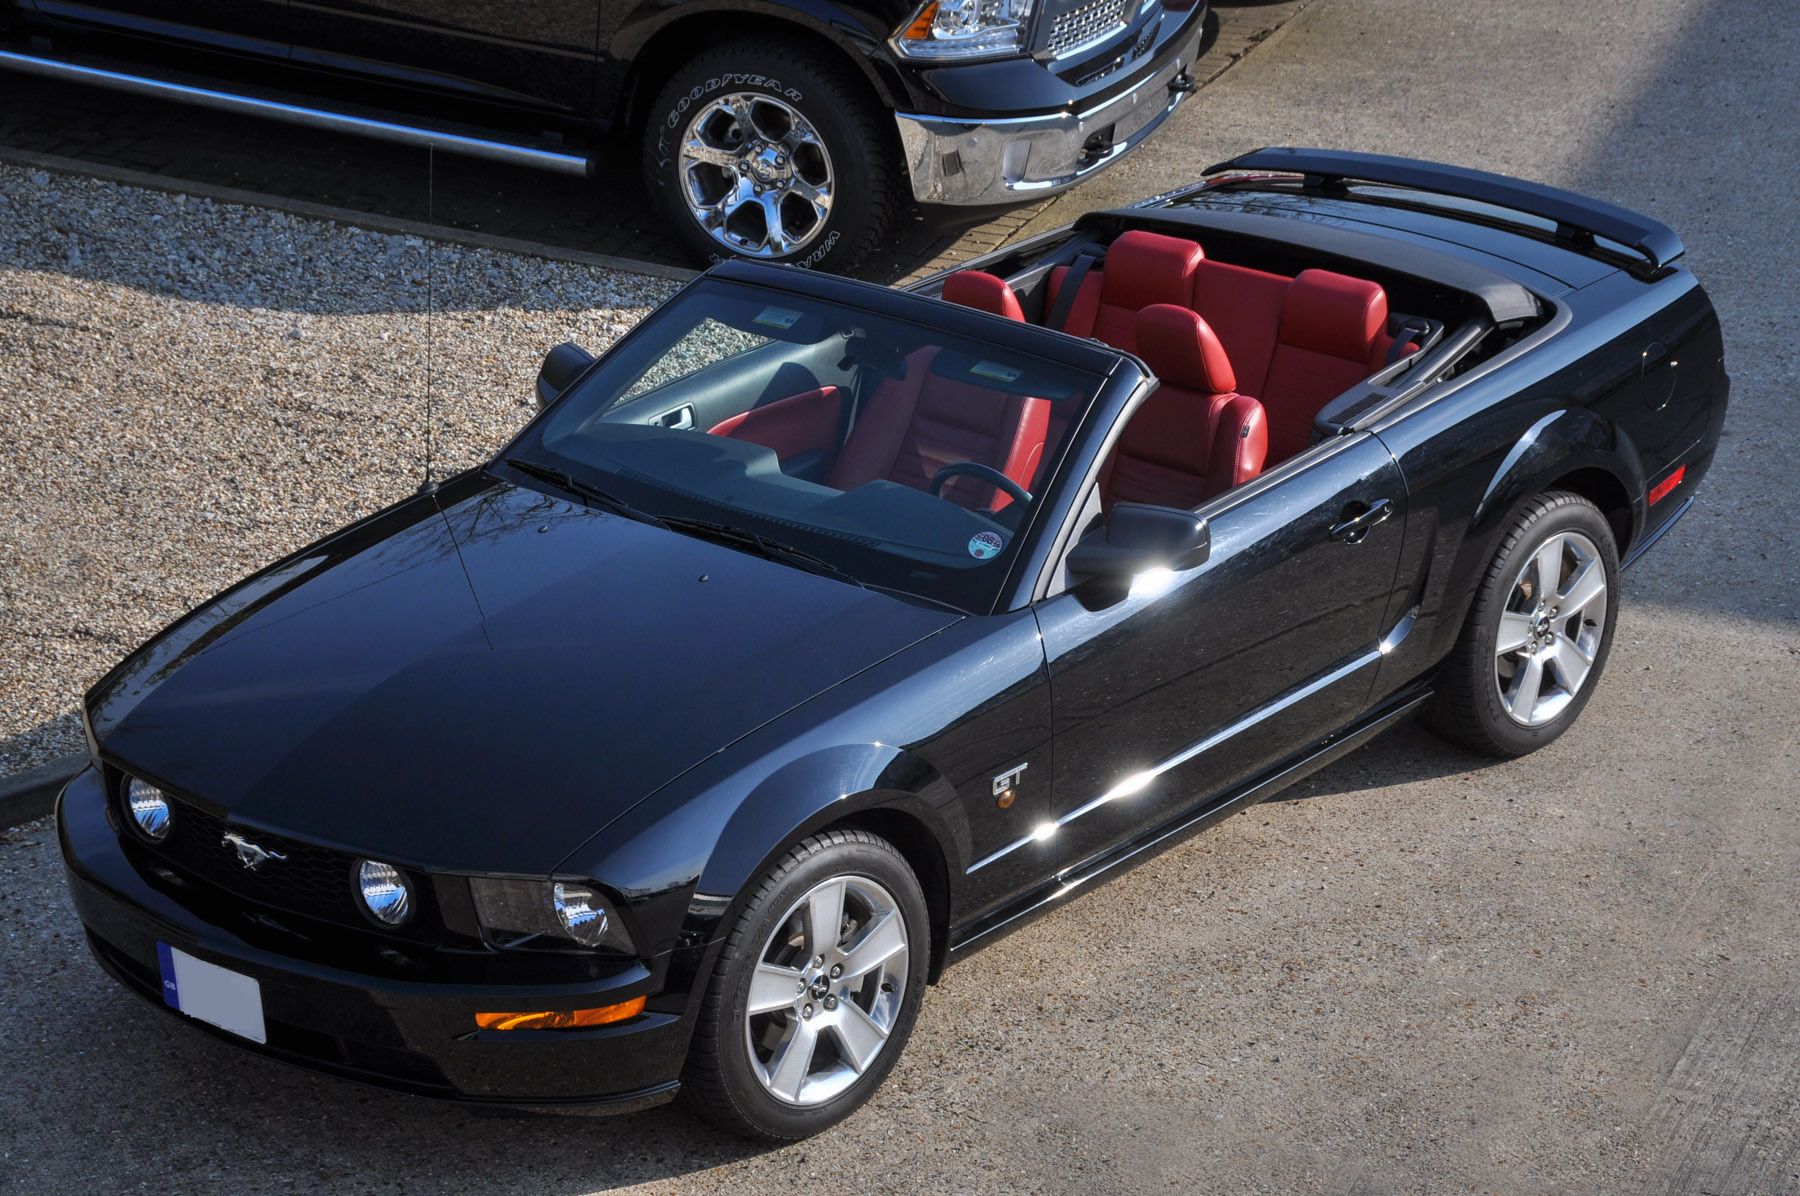 2006 55 ford mustang gt 4 6 litre v8 convertible premium 19 000 miles full history. Black Bedroom Furniture Sets. Home Design Ideas